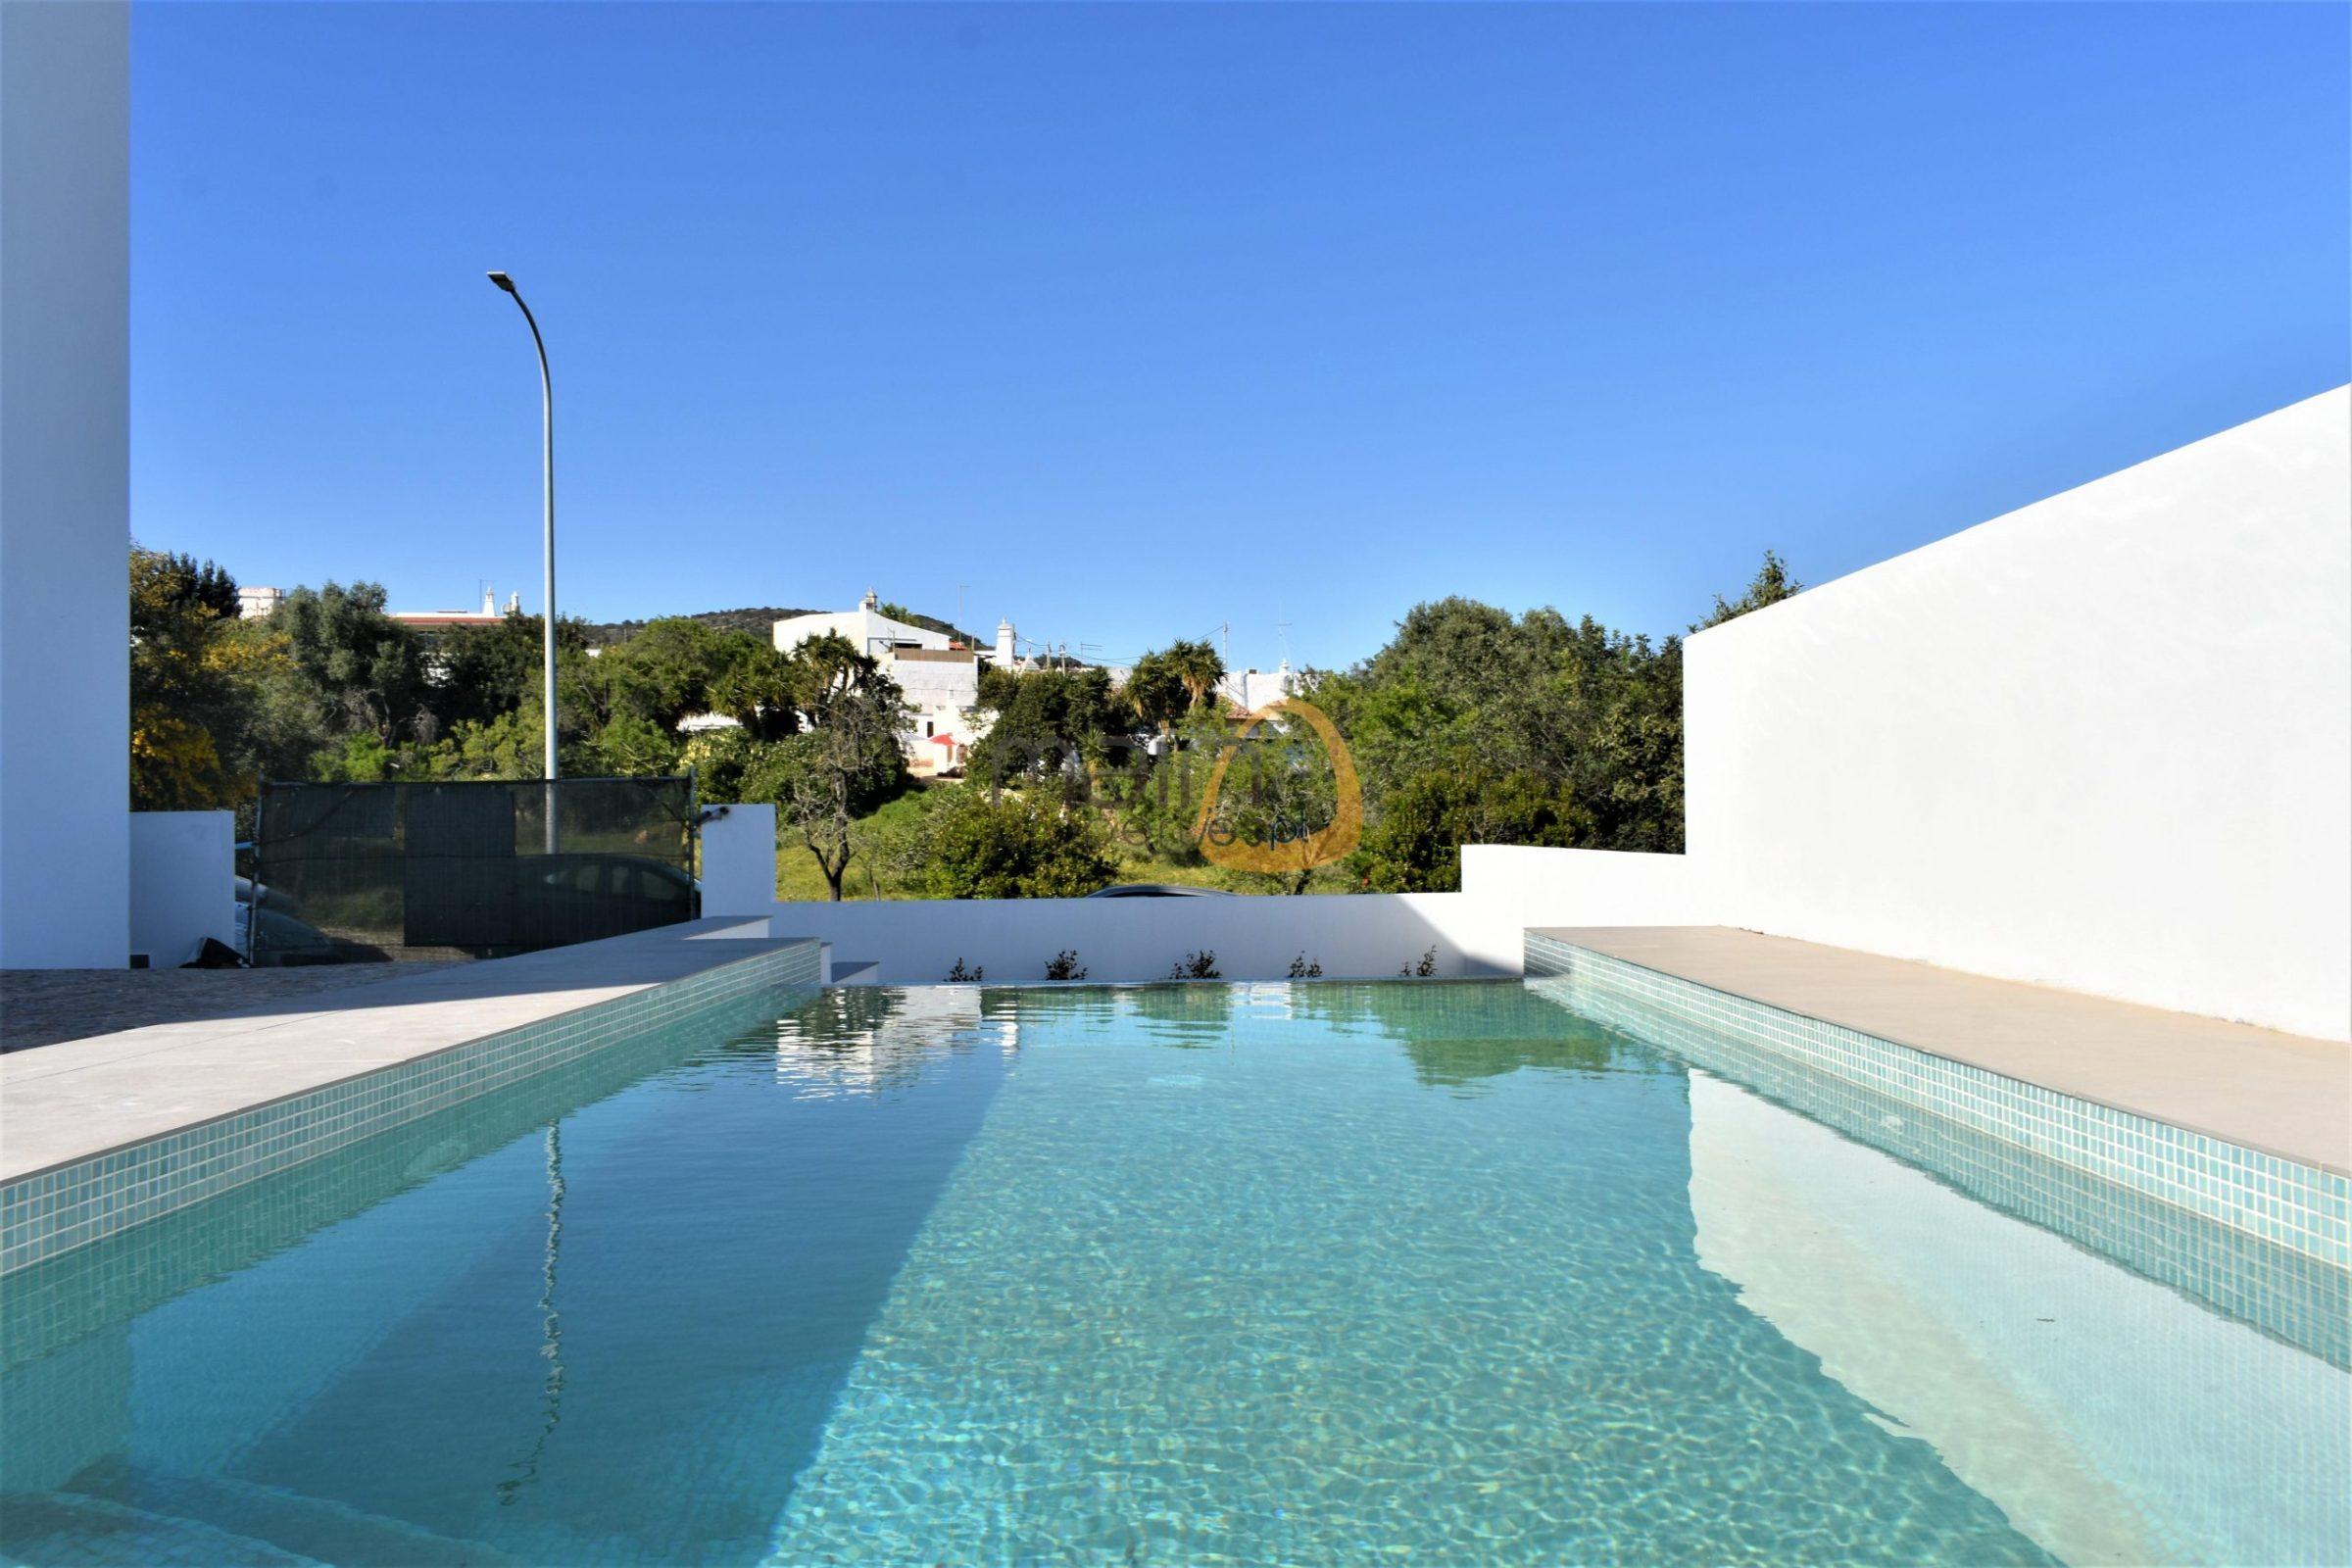 New villa with 3 bedrooms and private pool in Santa Barbara de Nexe